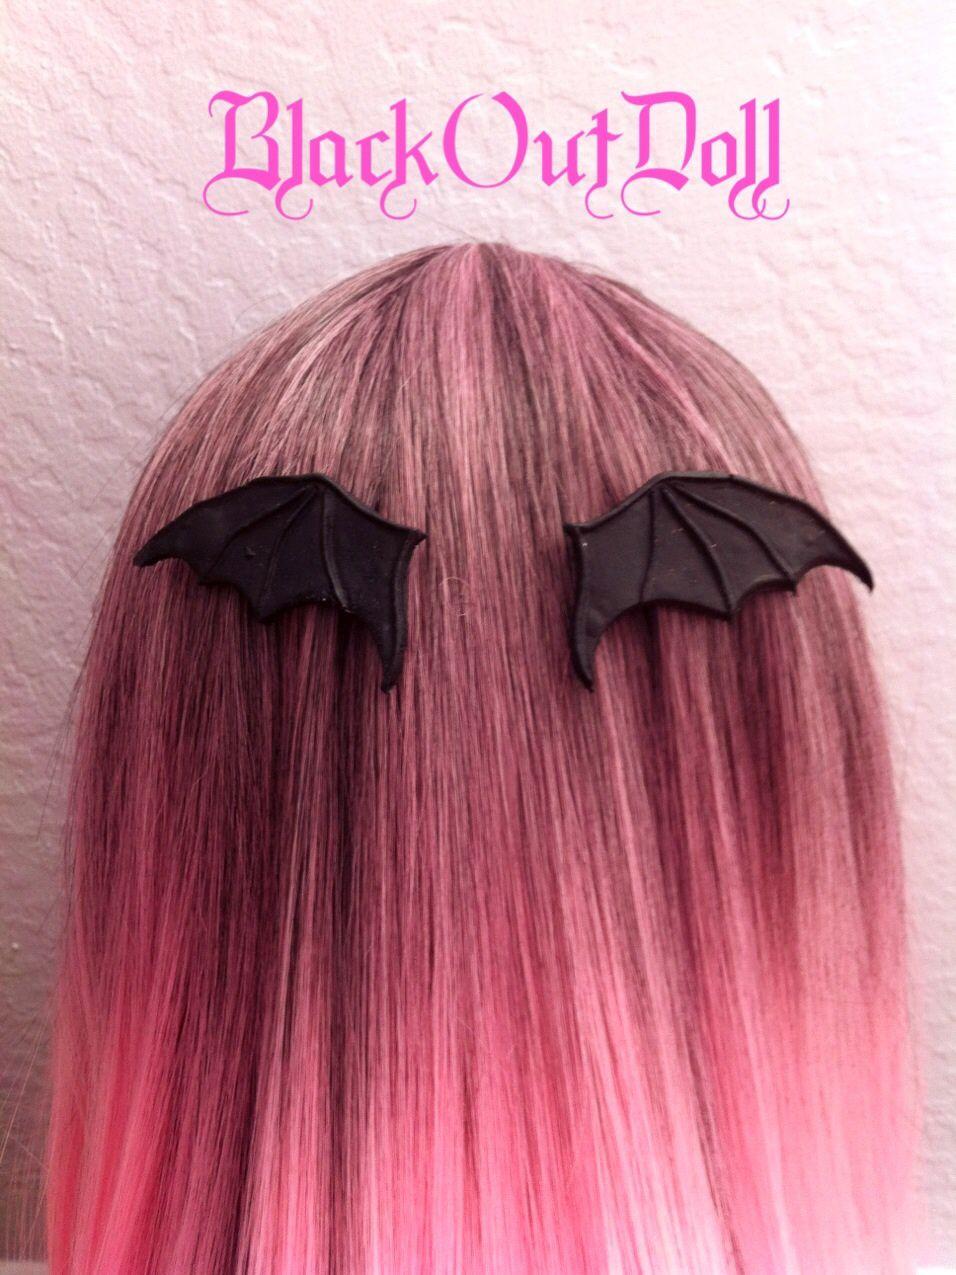 black bat wing hair clip